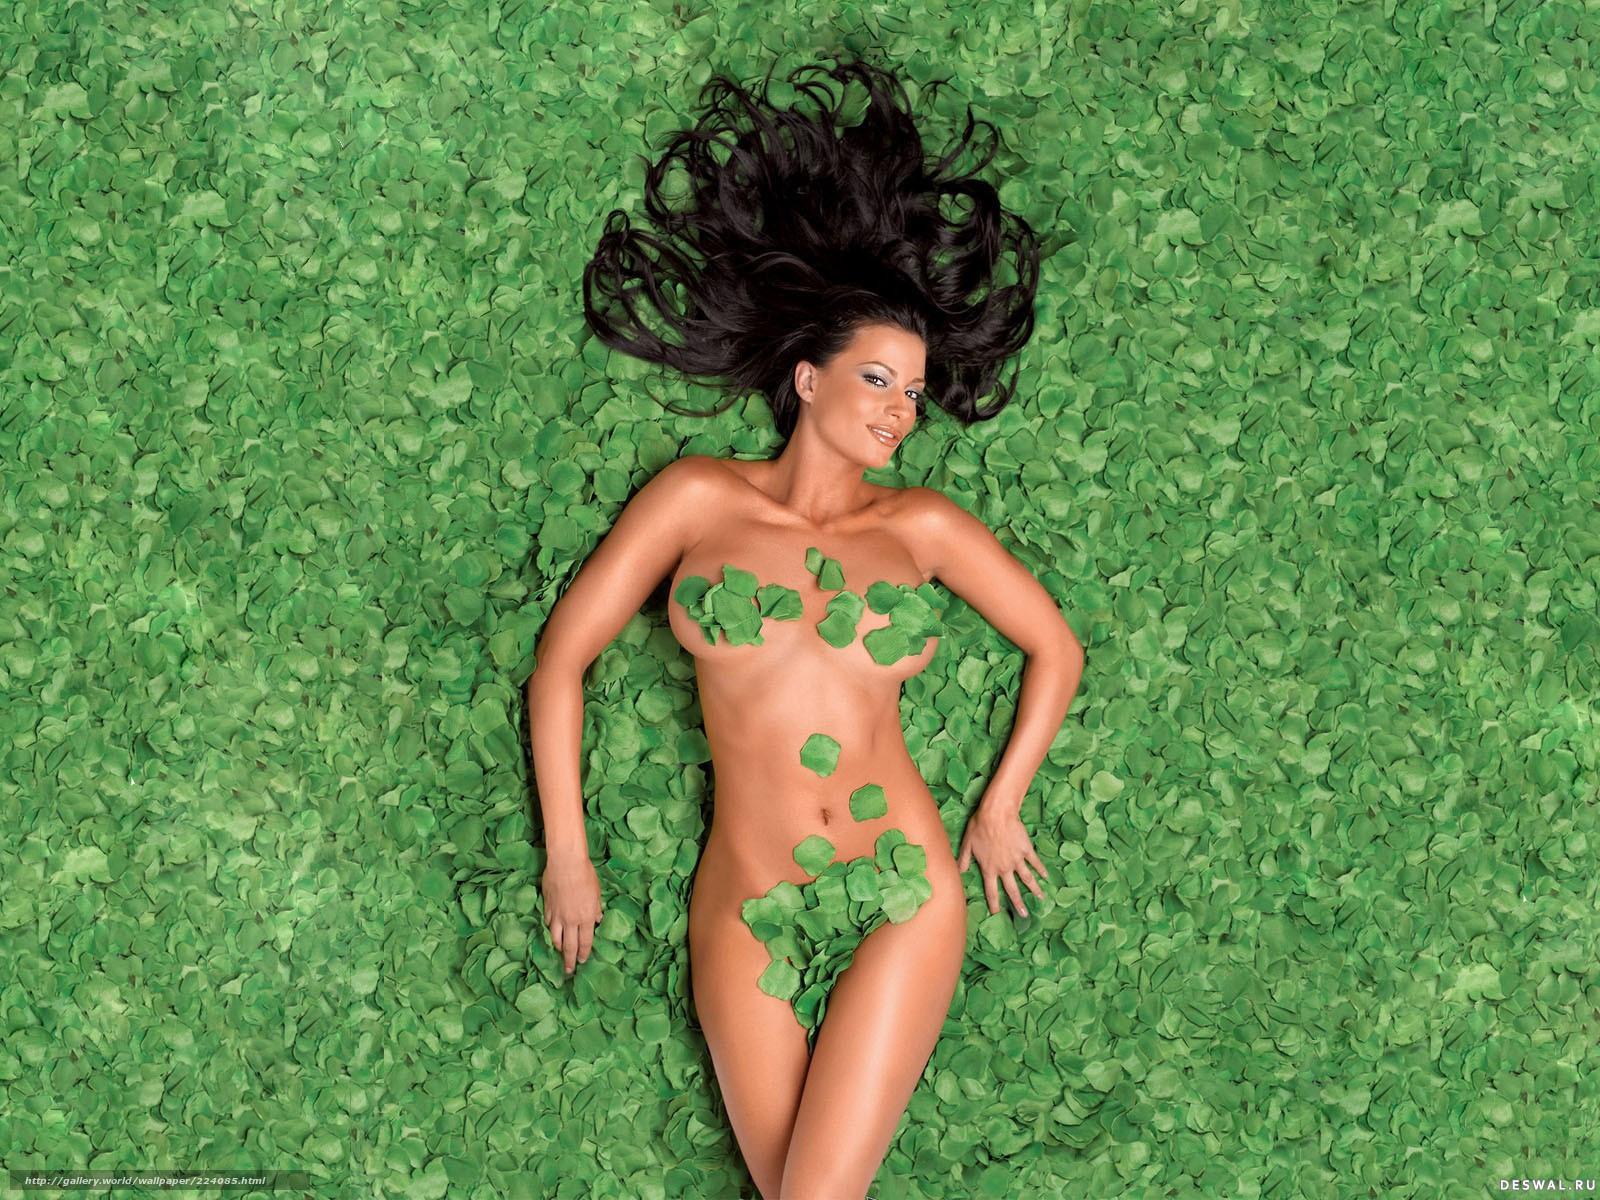 листья, зелень, брюнетка, загар, фигура, девушка, девушки ...